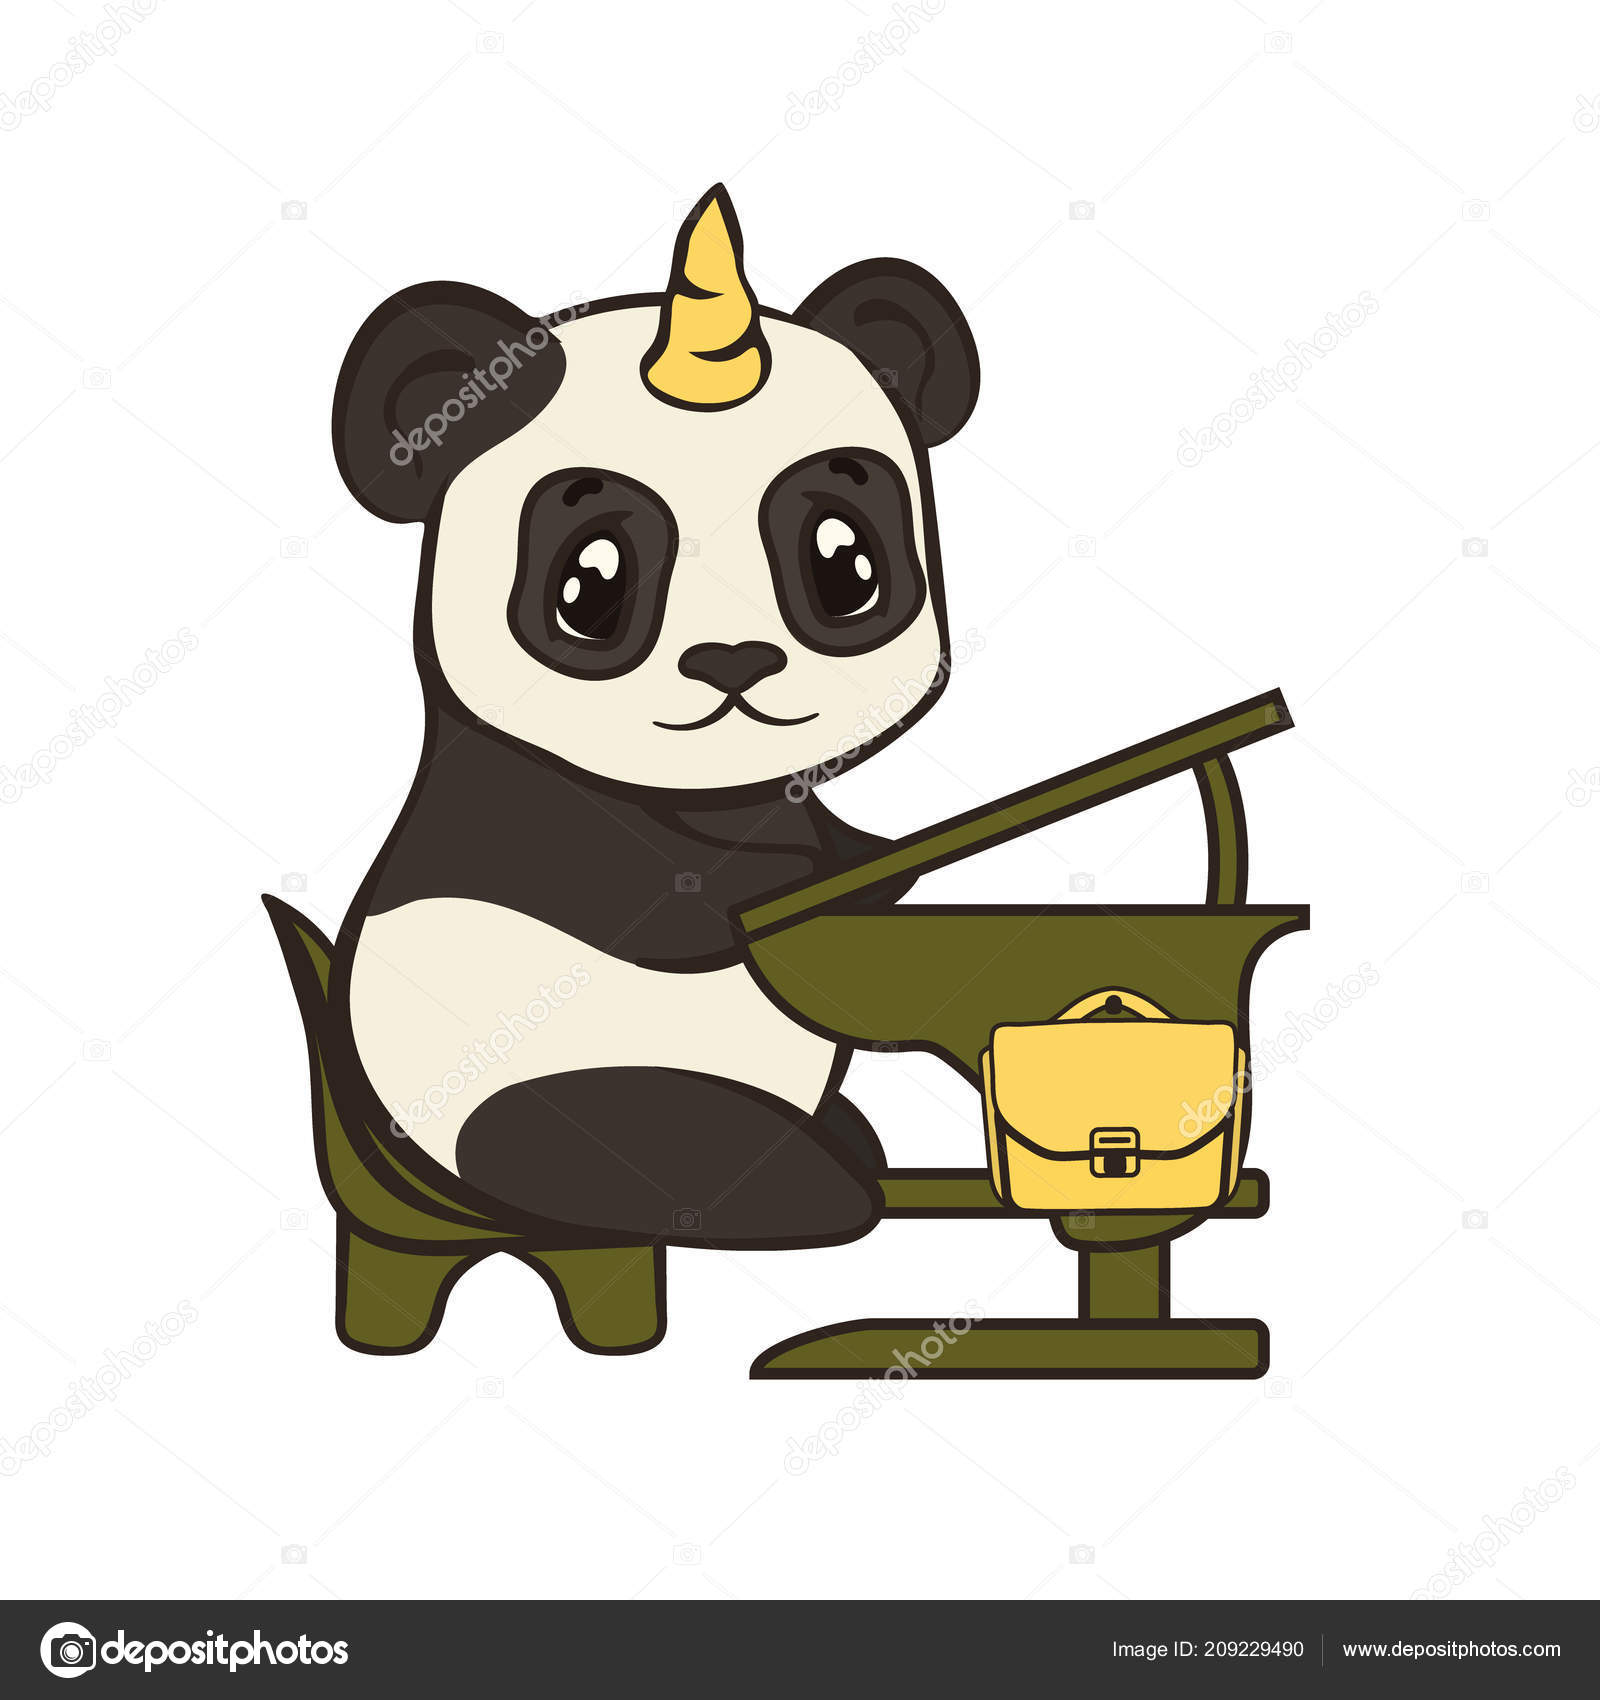 c52f0558d78159 Niedlicher Panda Bär Charakter Mit Einhorn Horn Sitzt Schulbank Zurück —  Stockvektor